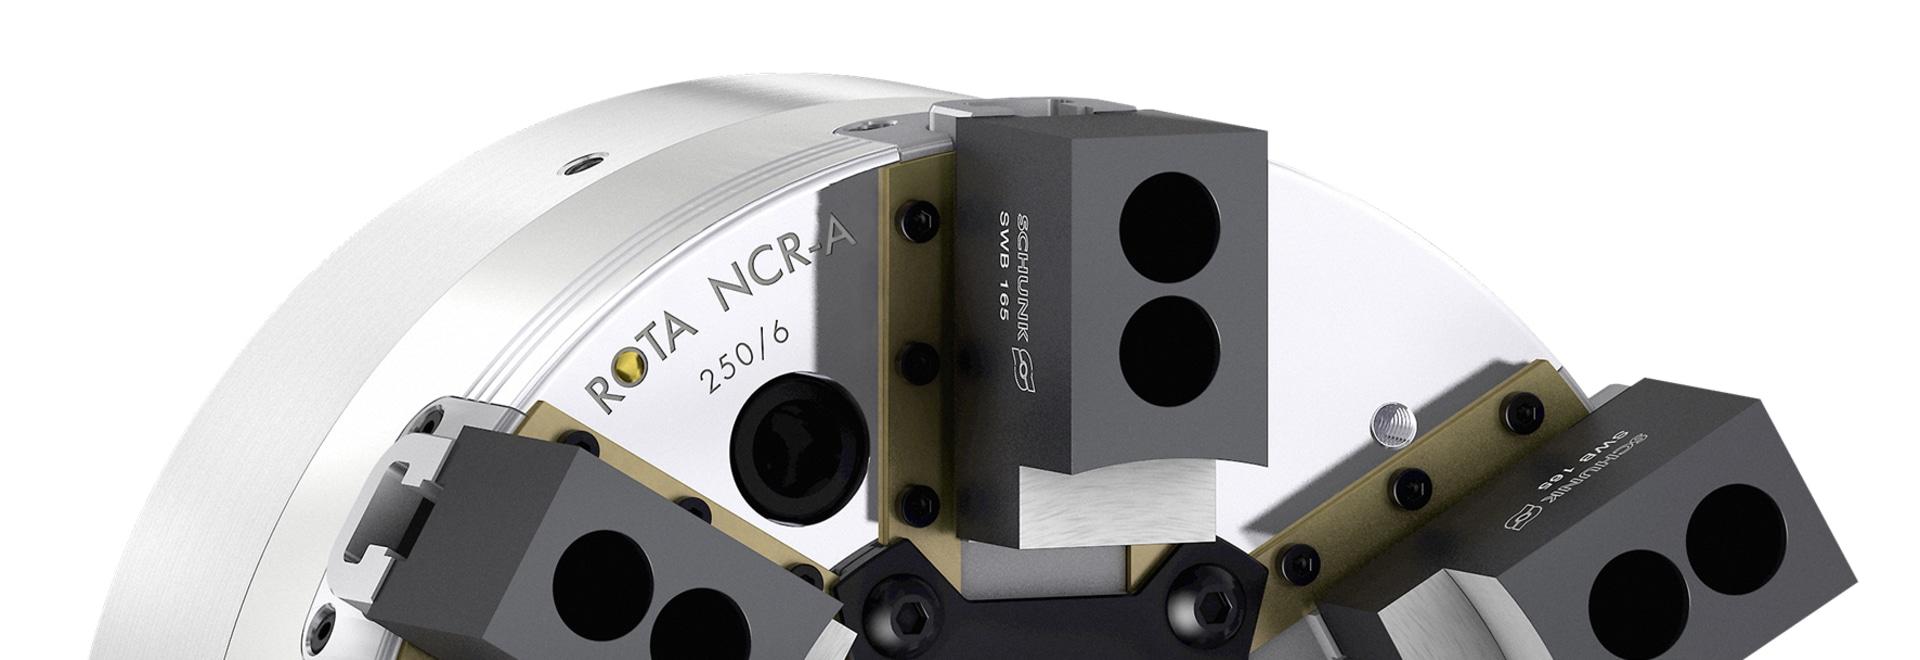 ROTA NCR-A